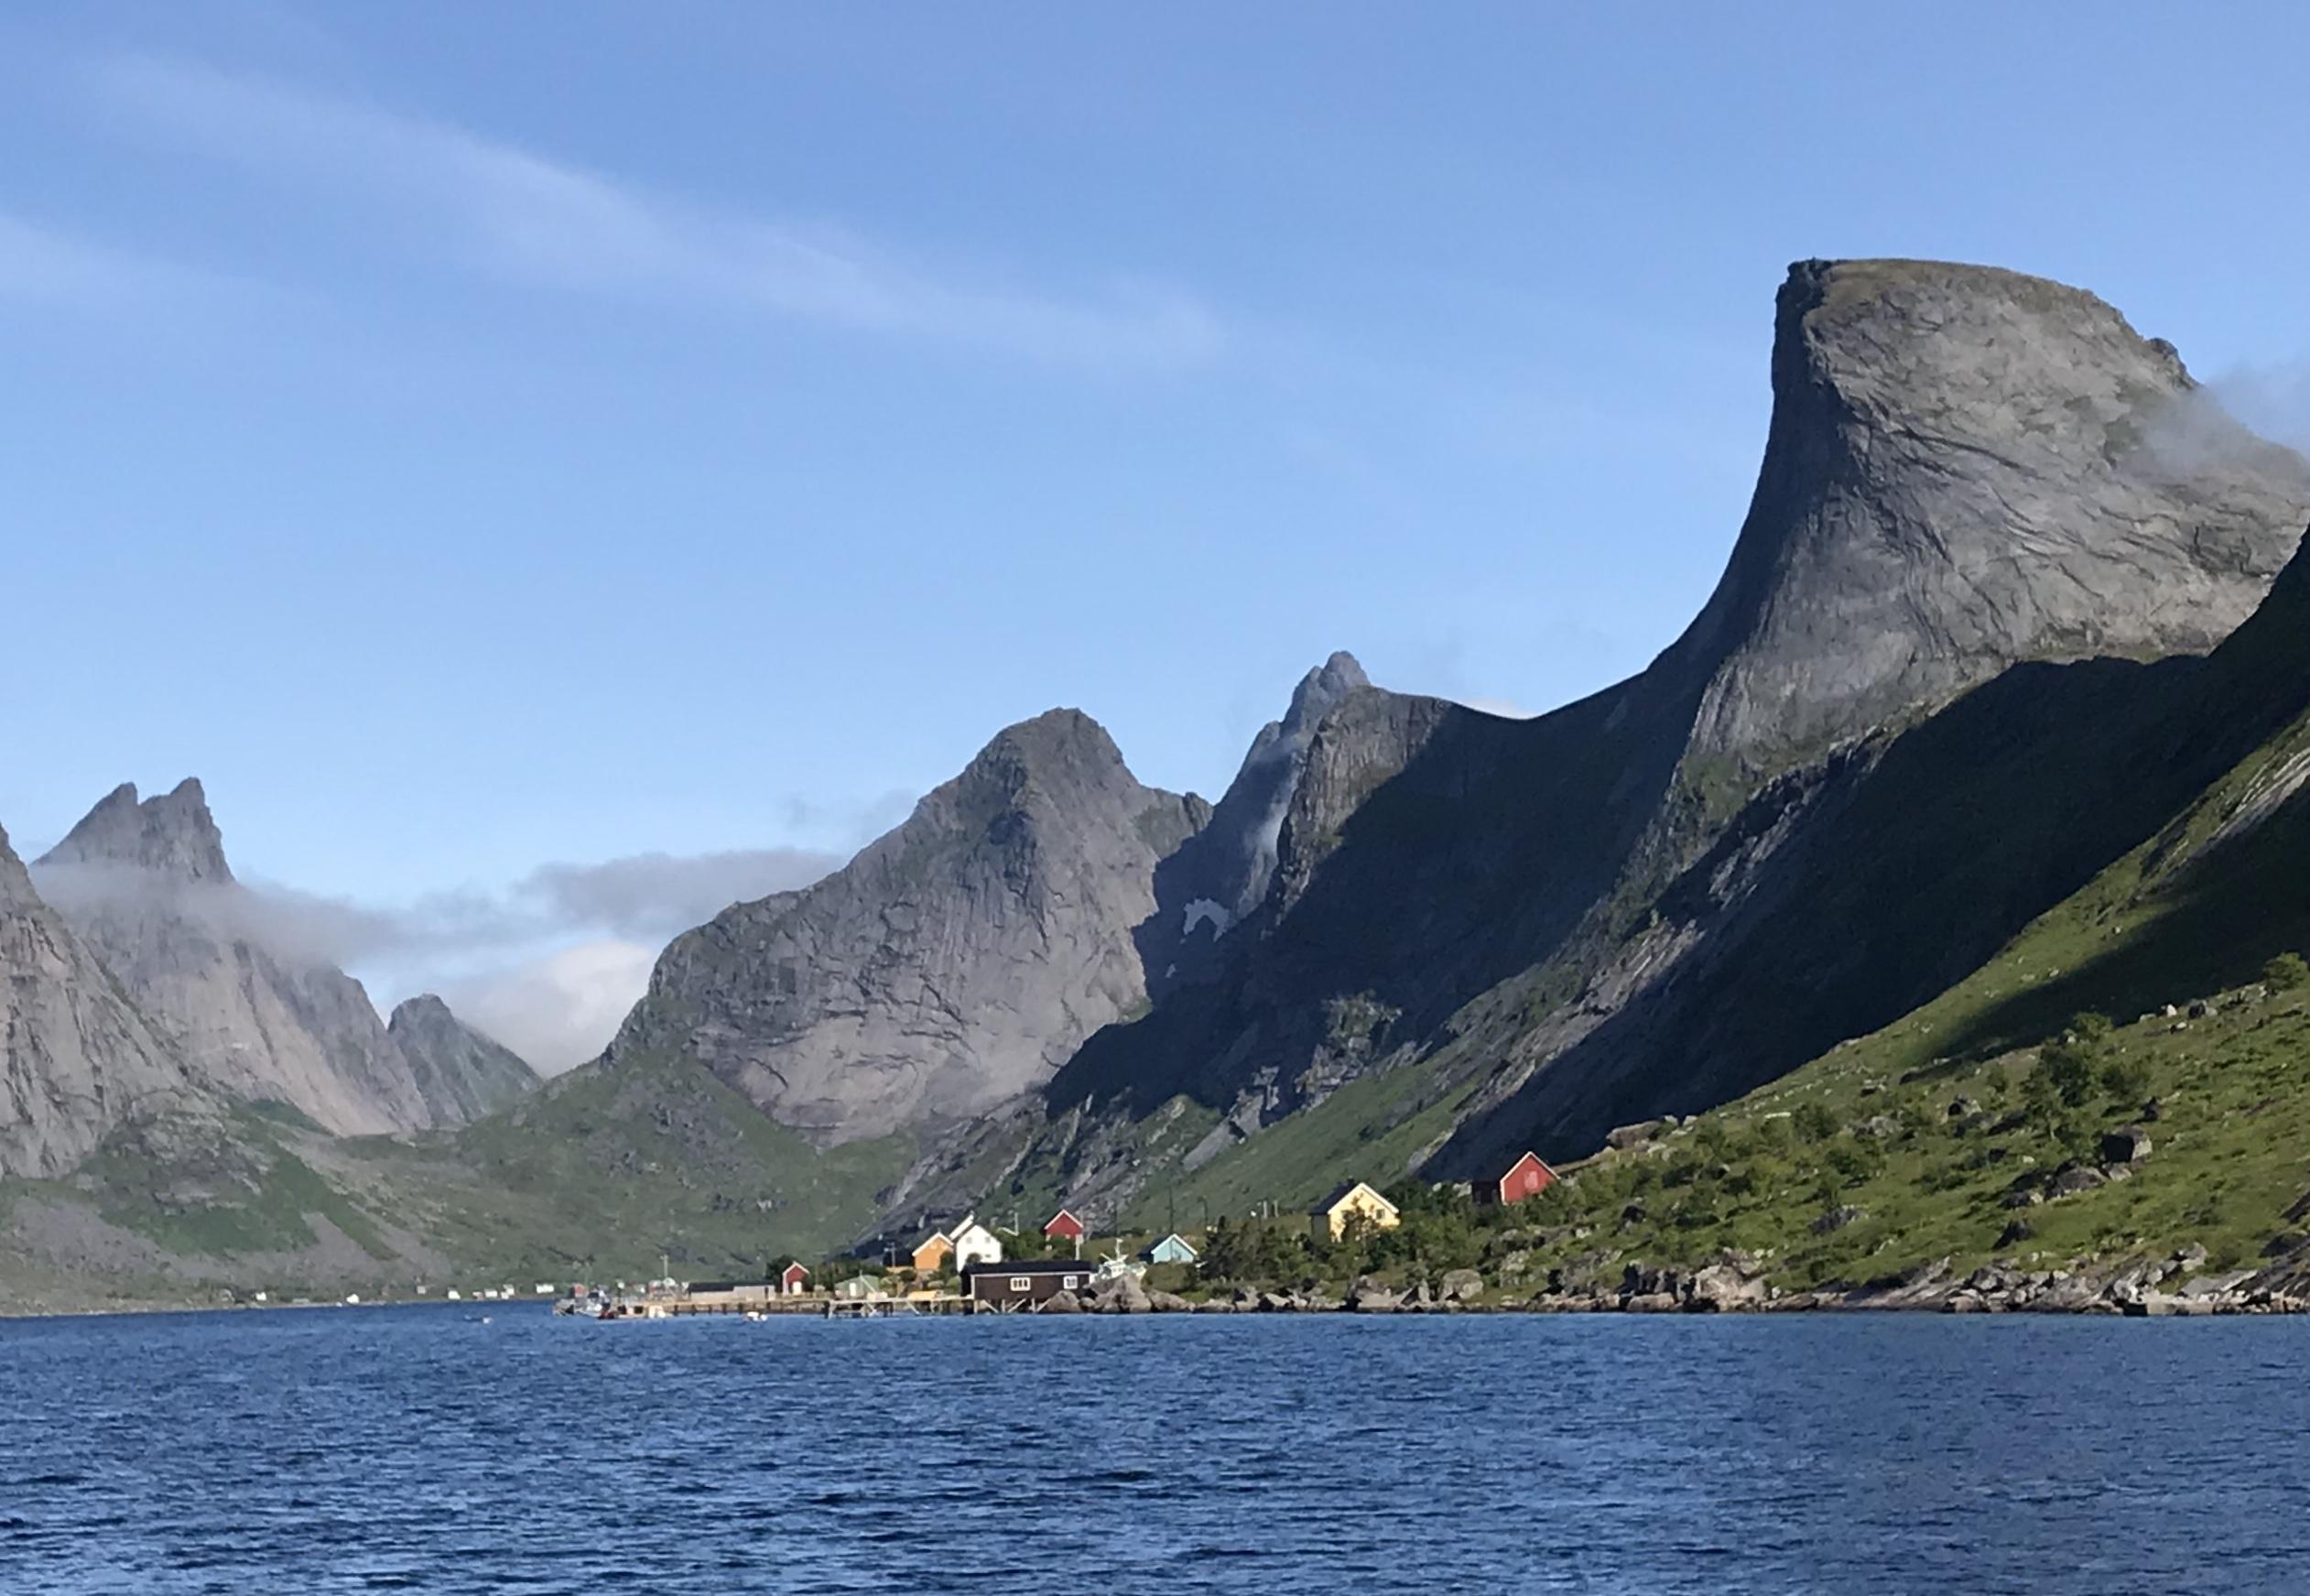 Hamnøy - Vindstad/ Kirkefjorden return trip